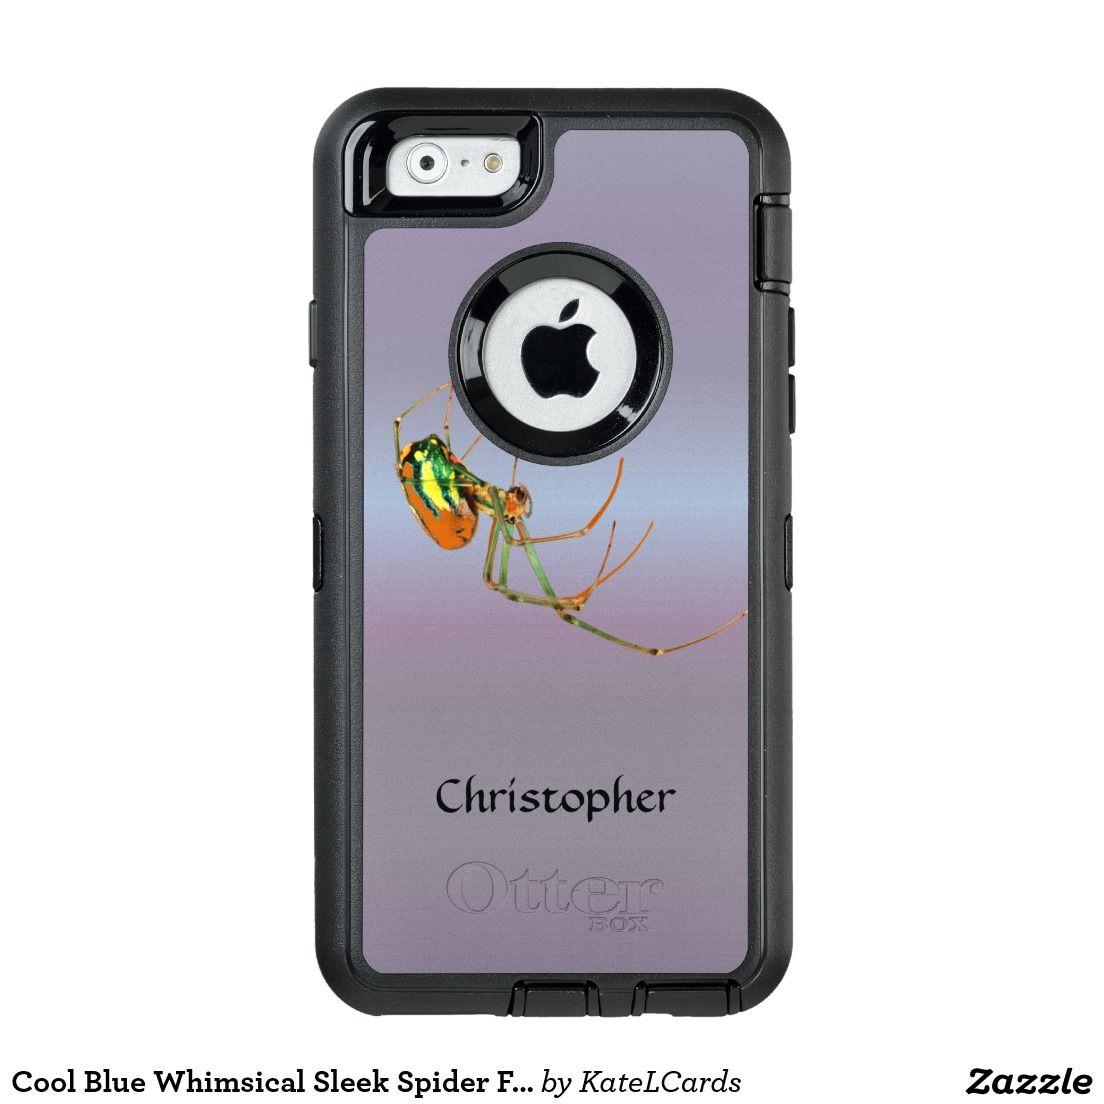 Cool Blue Whimsical Sleek Spider Fun Custom OtterBox iPhone 6 6s Case d88e37ed3